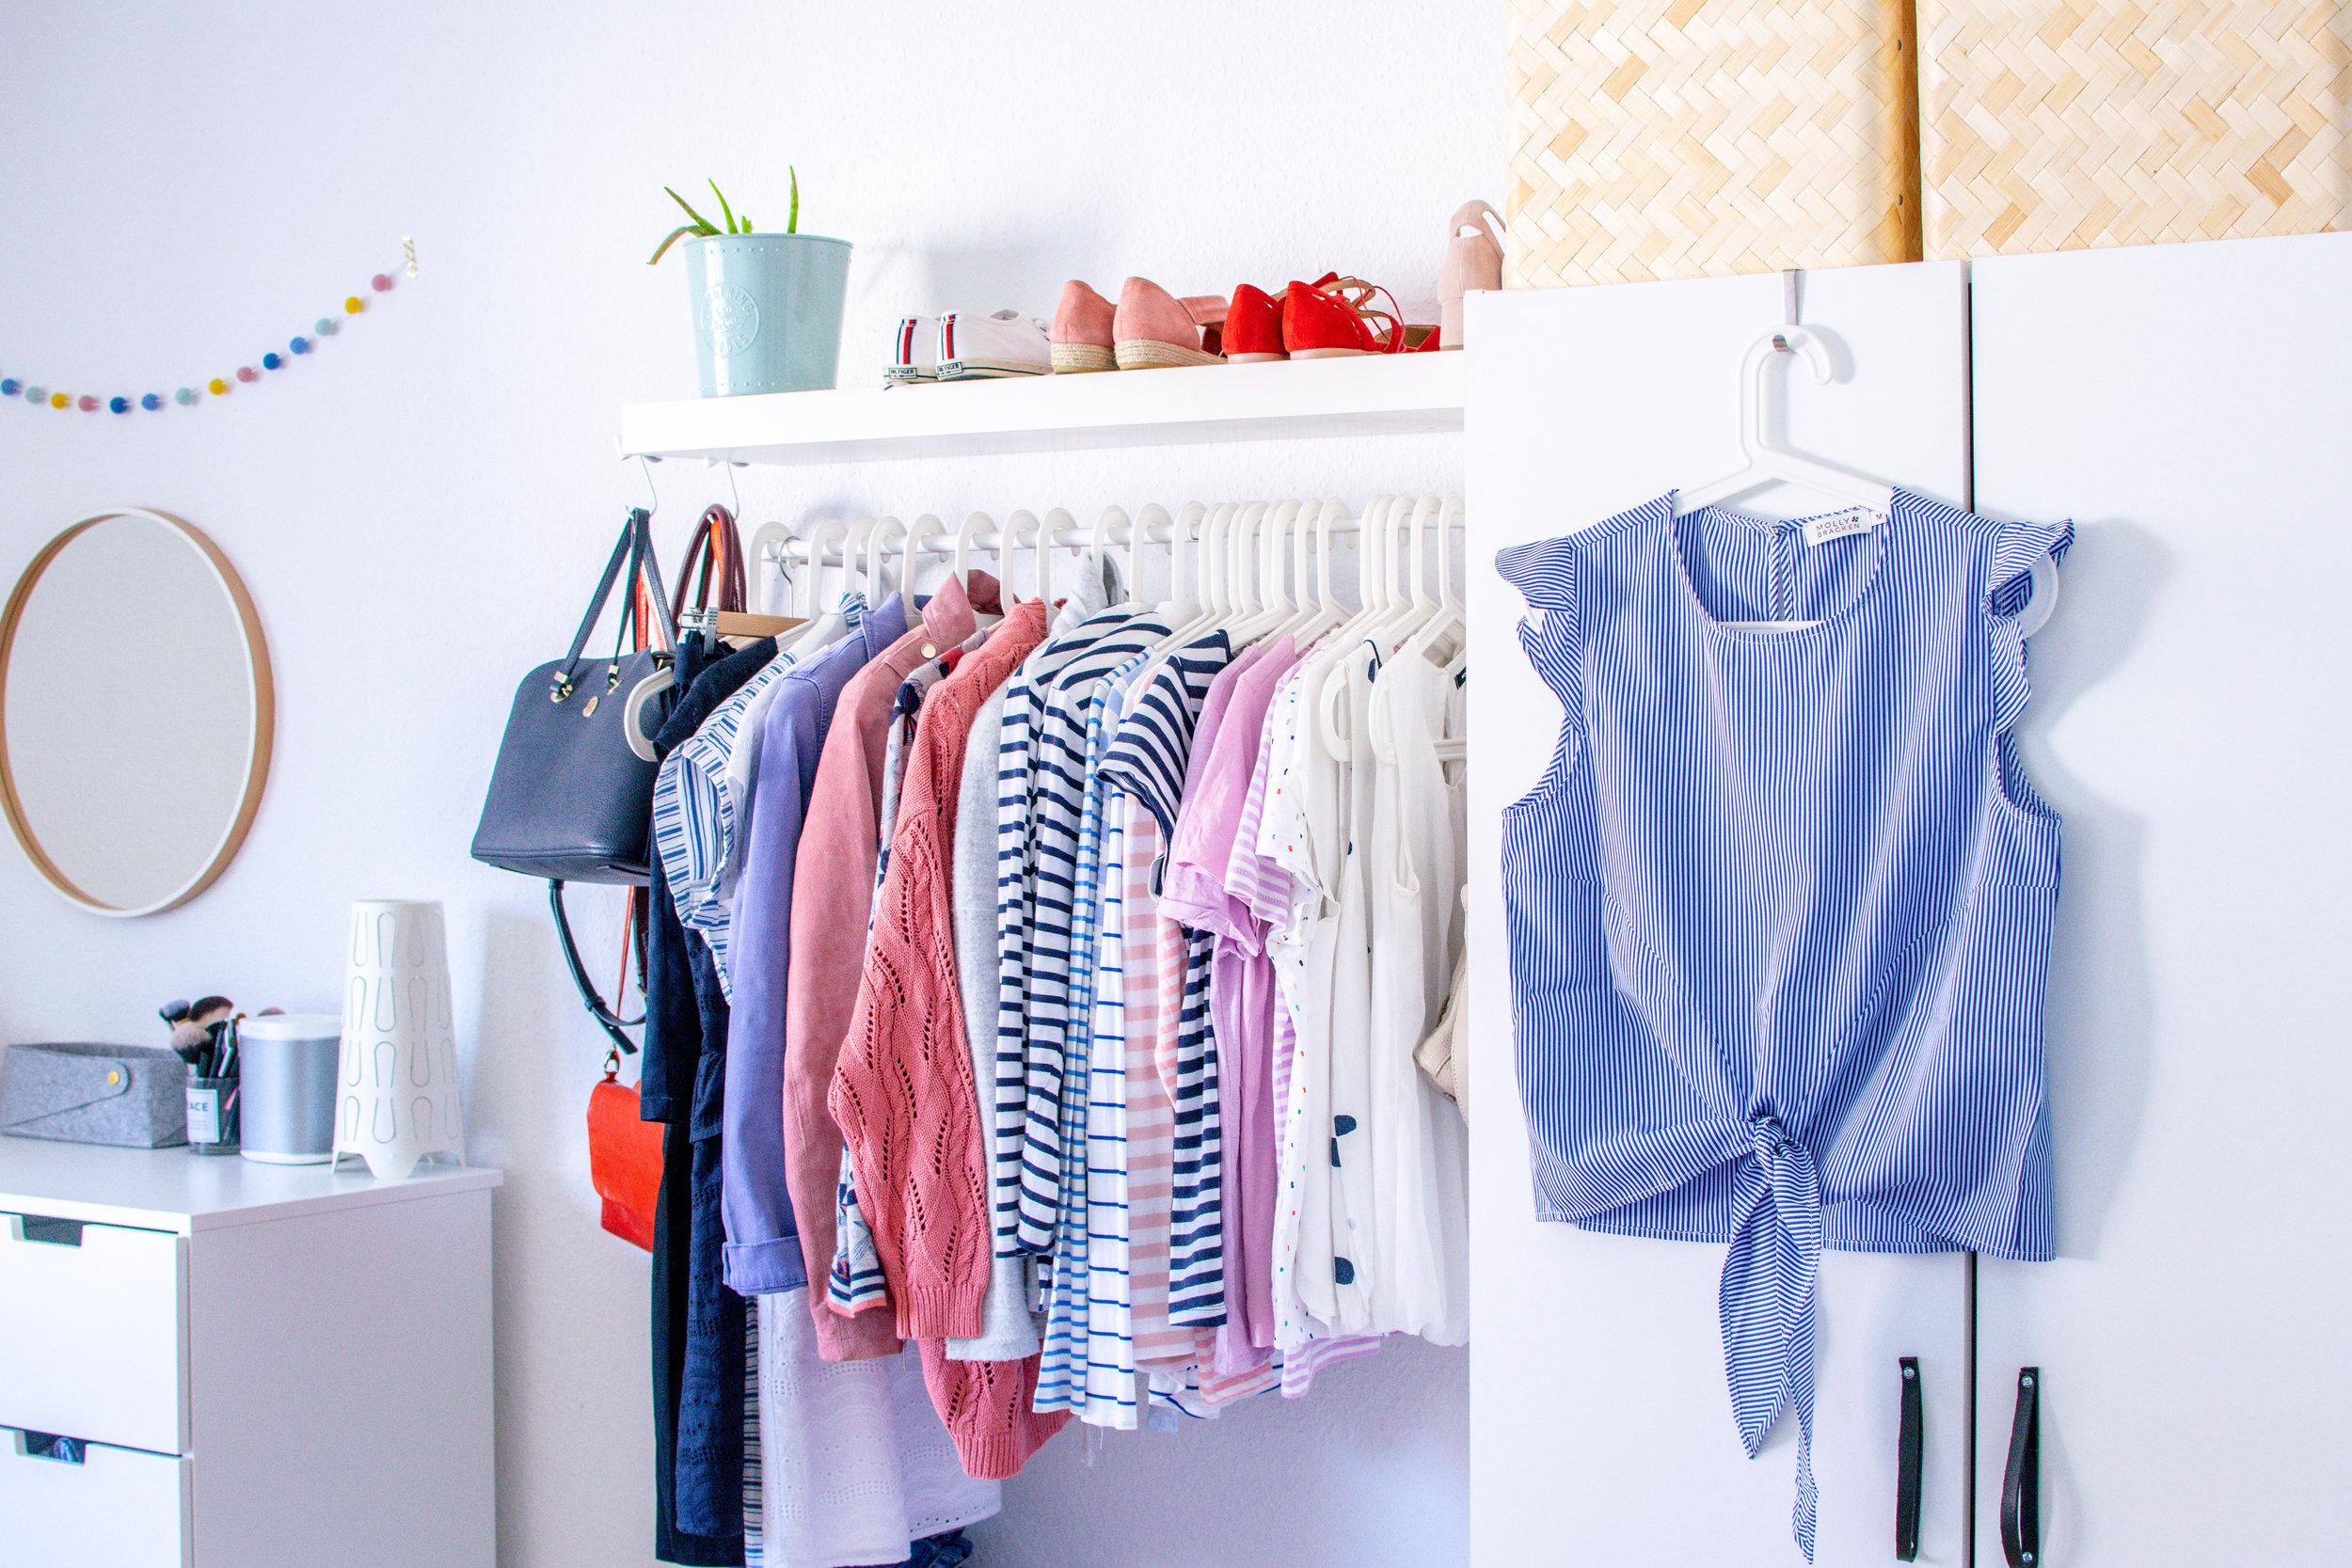 capsule wardrobe striped blouse shirt